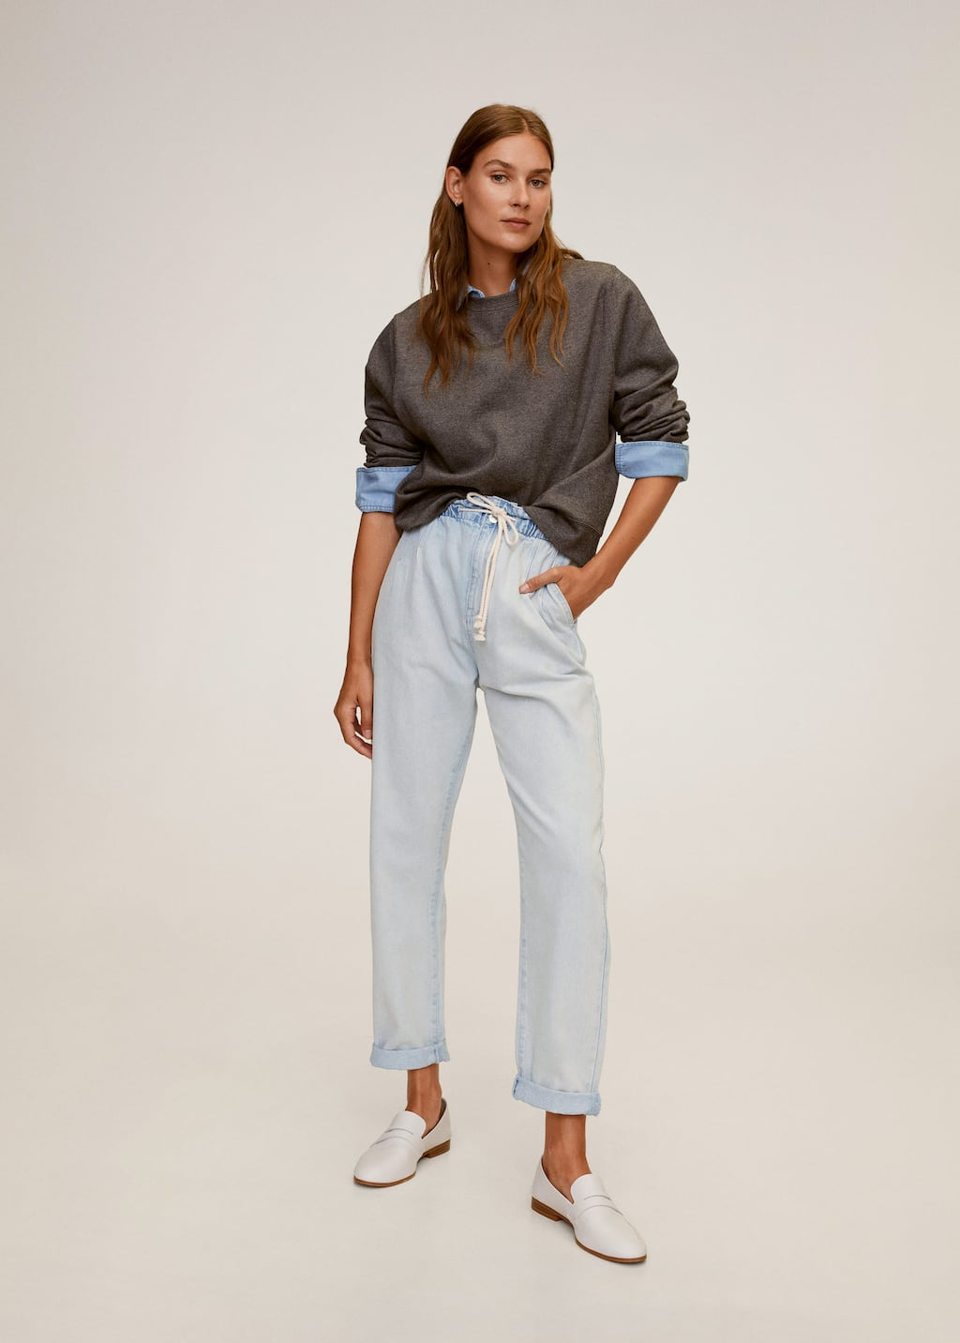 Baggy straight jeans with drawstring waist - Medium plane